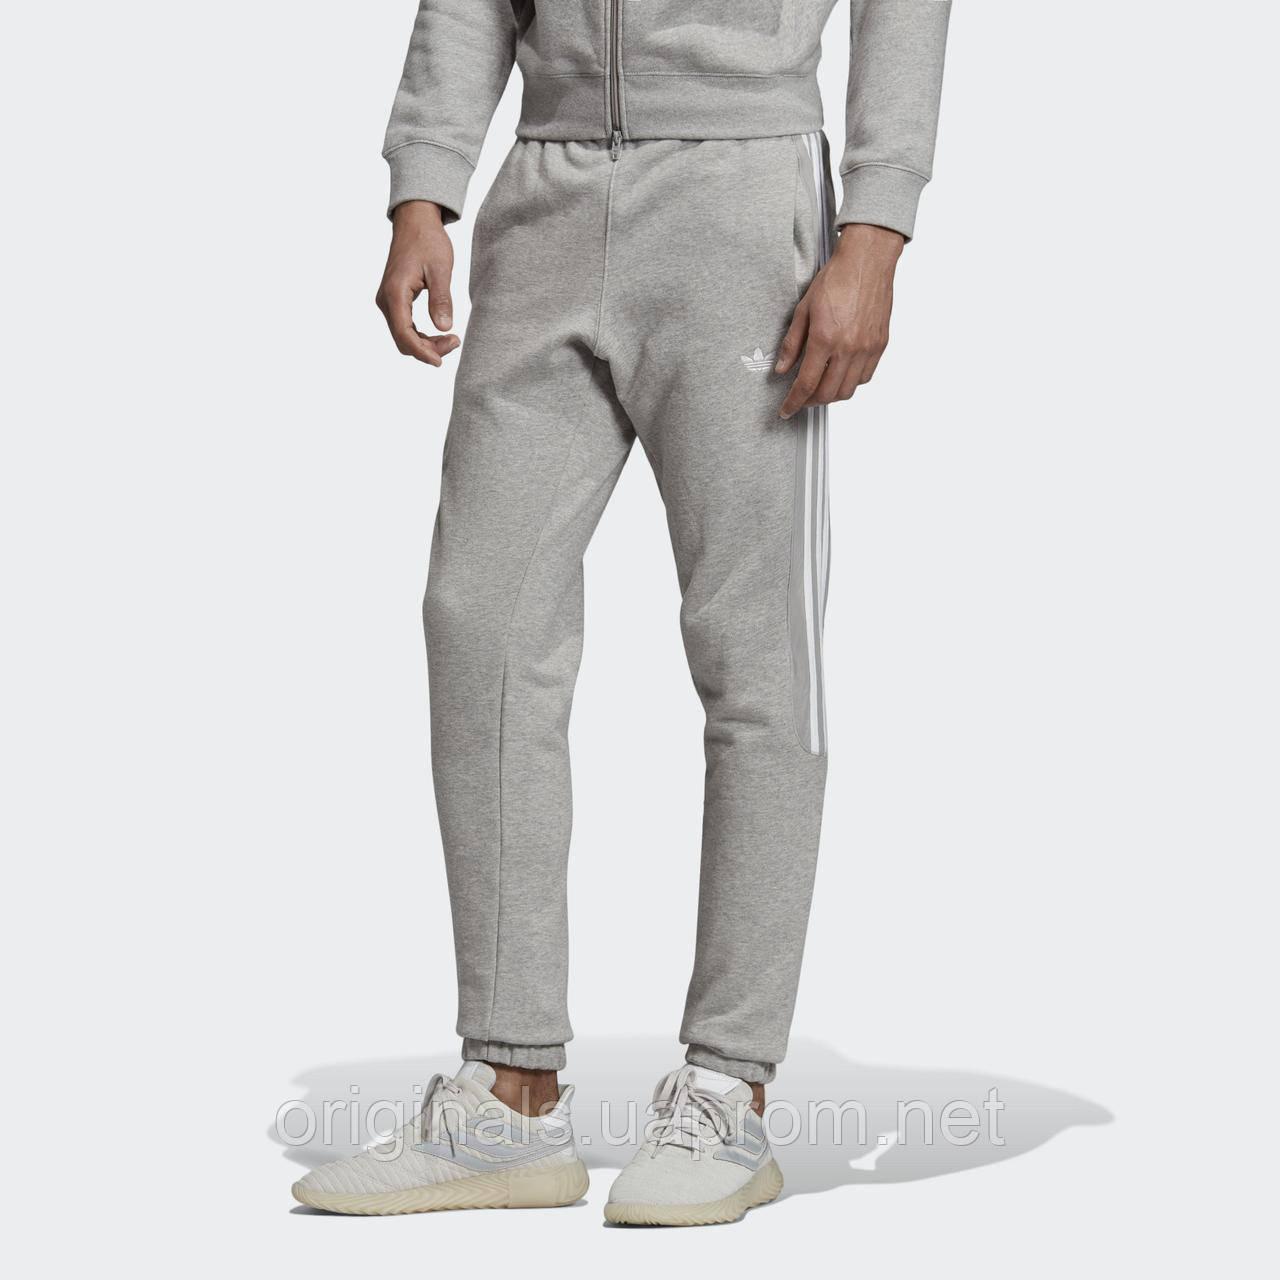 Брюки мужские Adidas Radkin DU8138